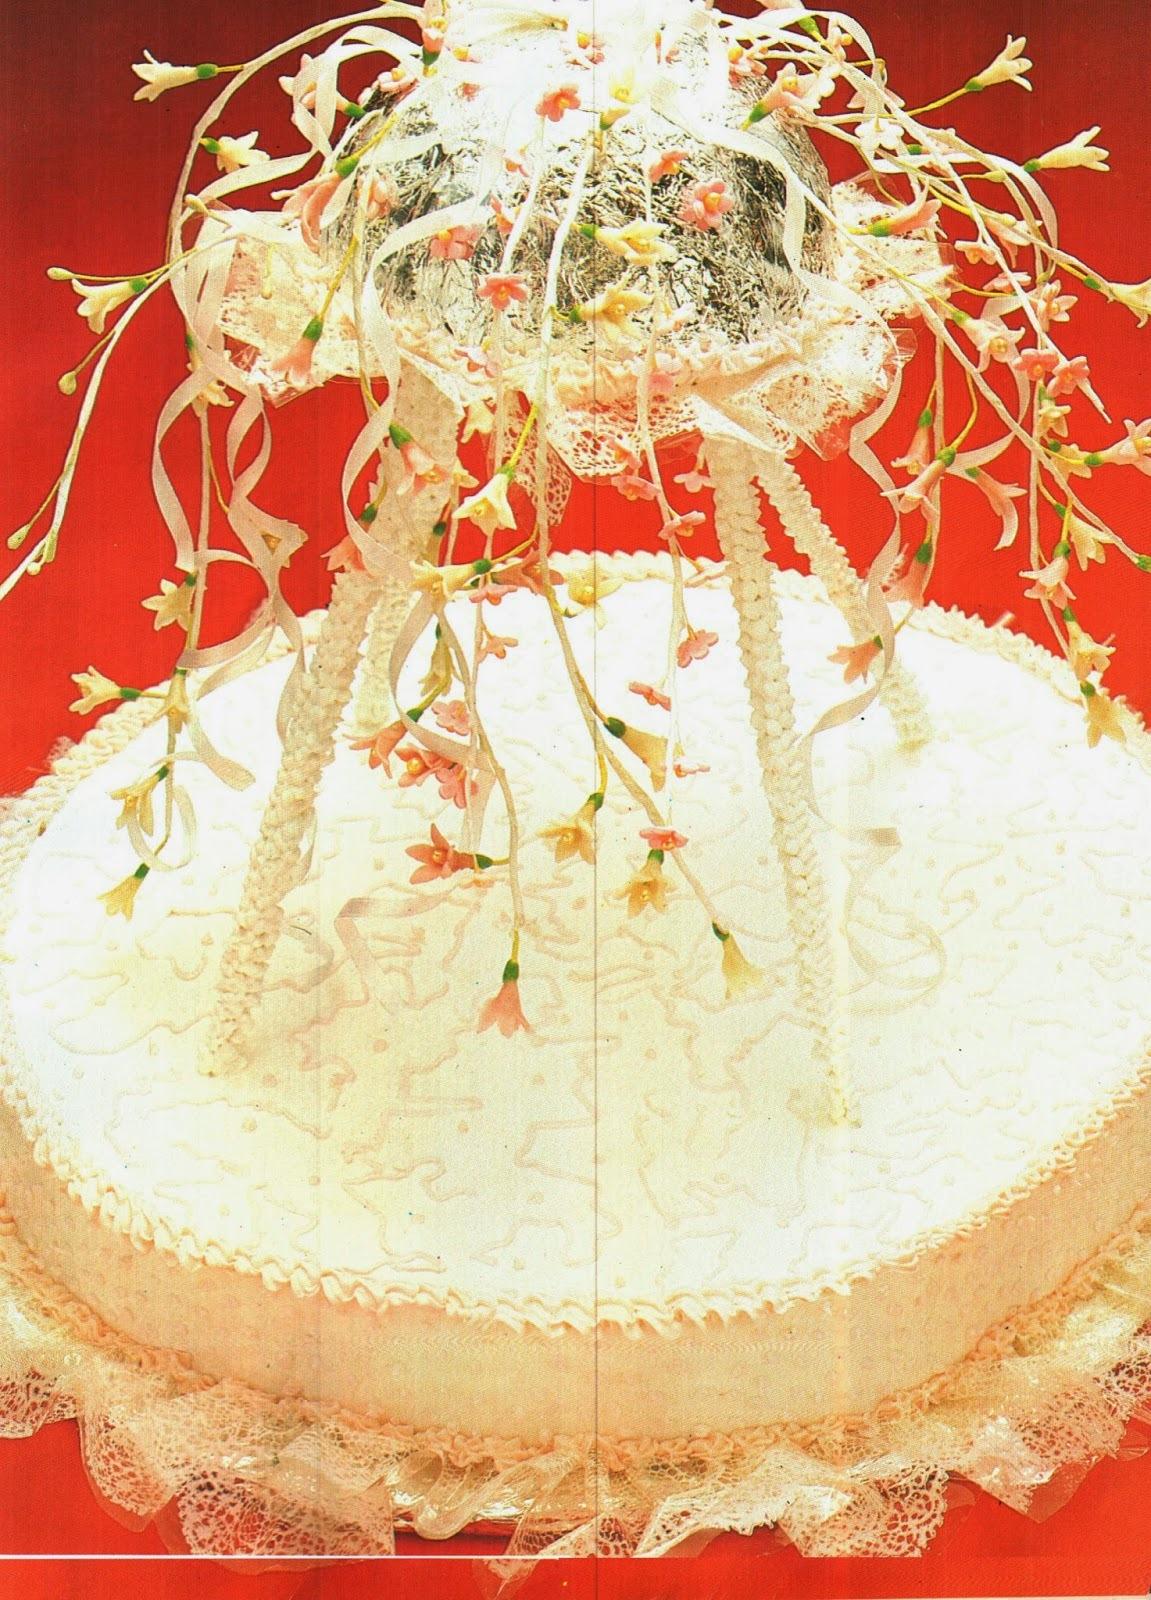 como fazer renda de açucar para bolo